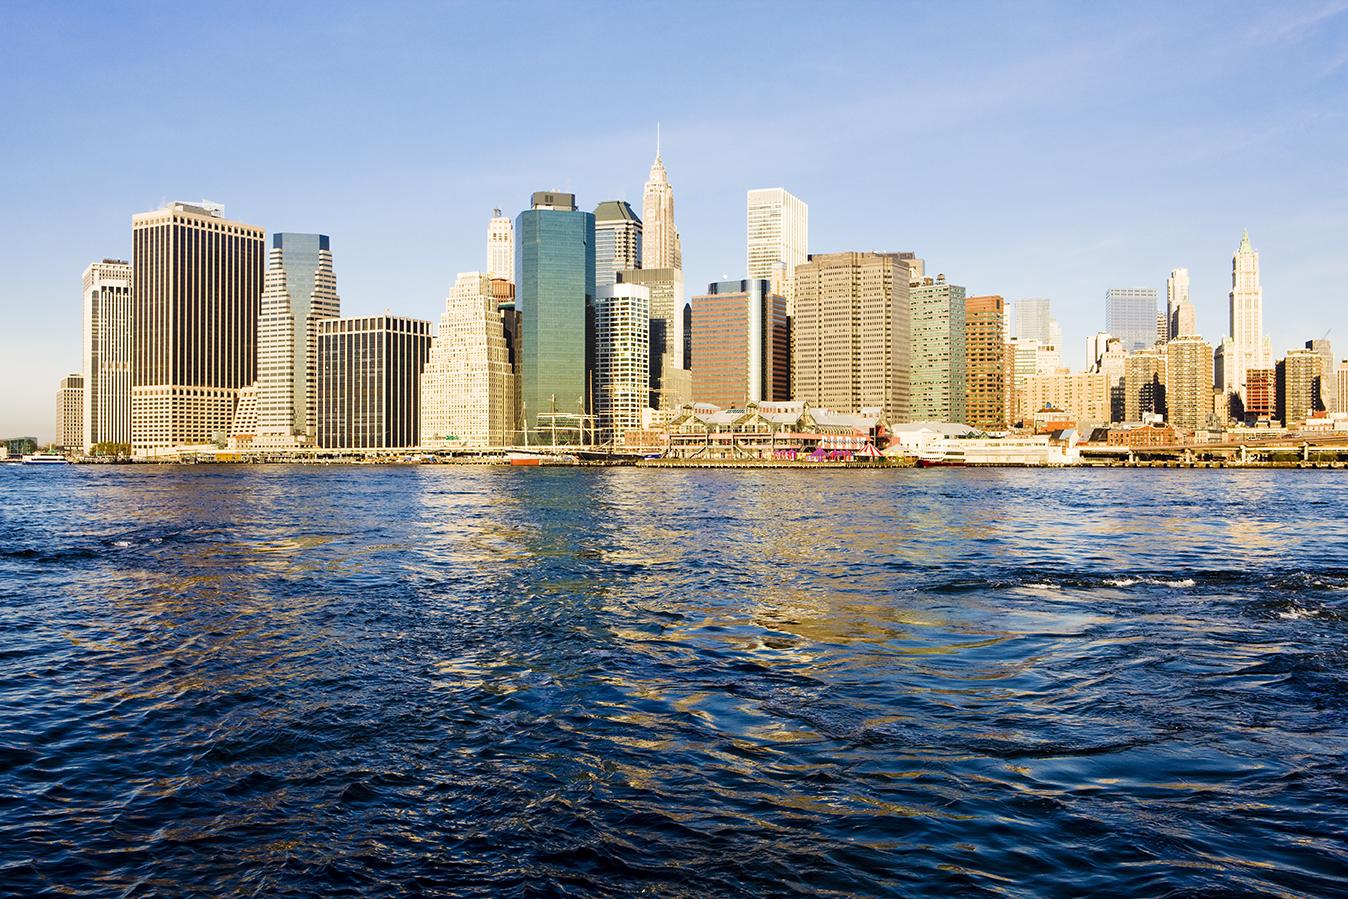 City Comptroller New York